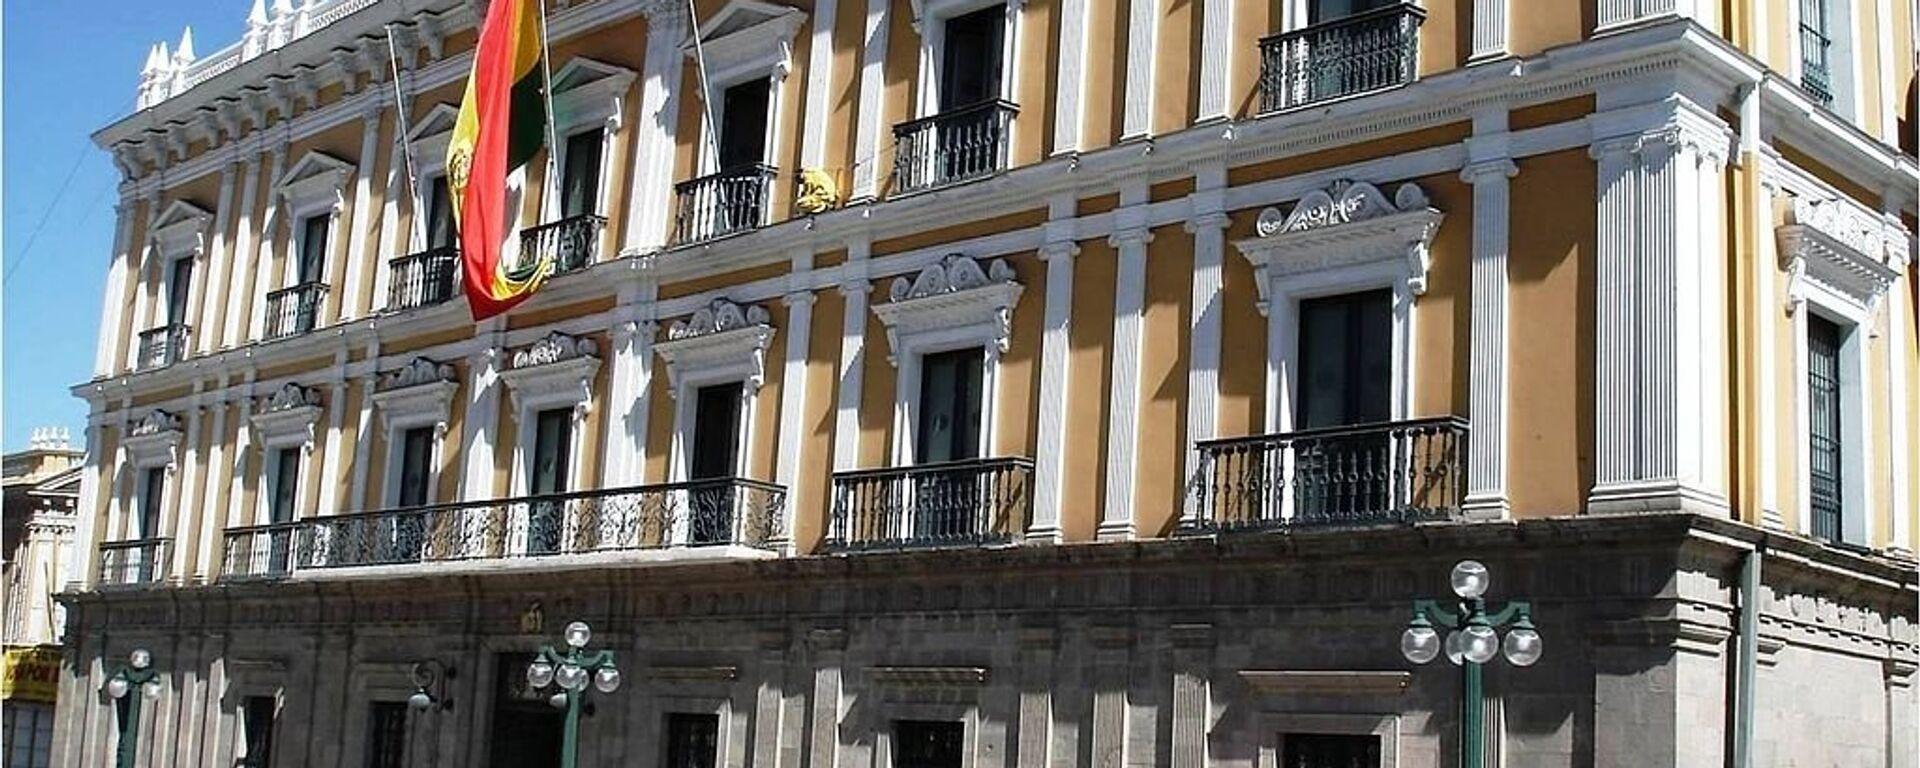 Palacio de Gobierno en La Paz, Bolivia. - Sputnik Mundo, 1920, 27.11.2020